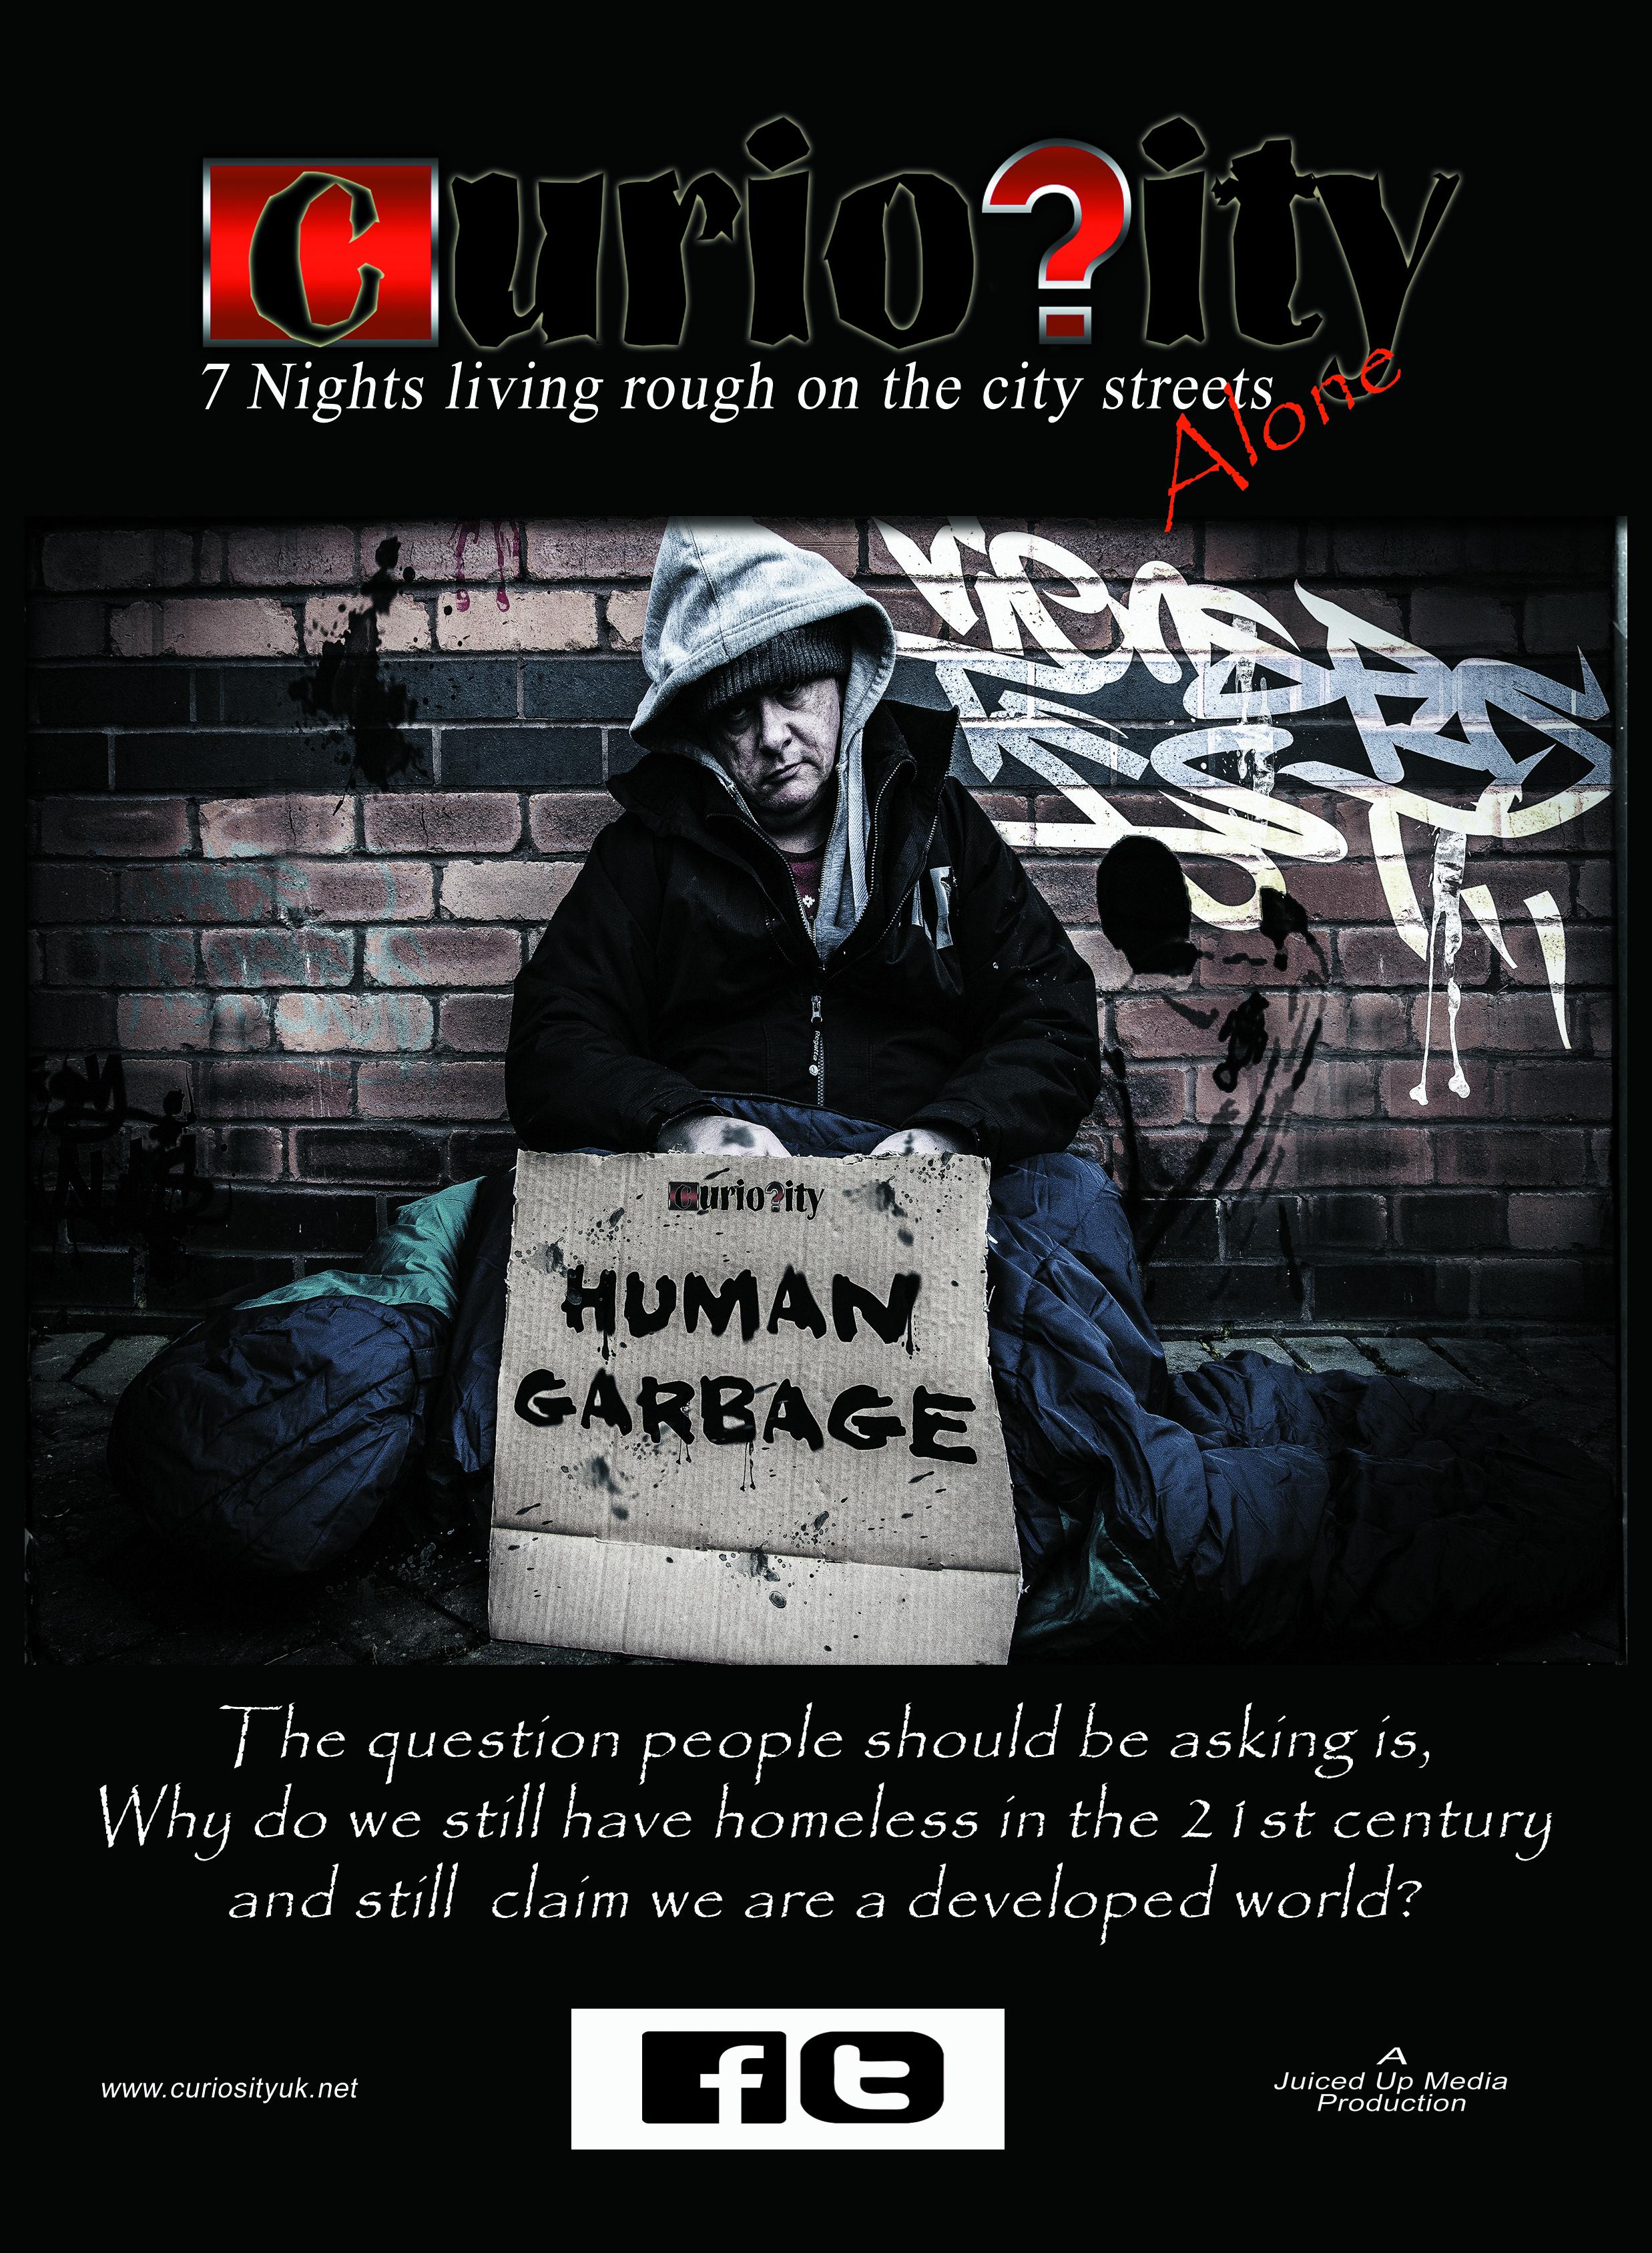 Curiosity - Human Garbage